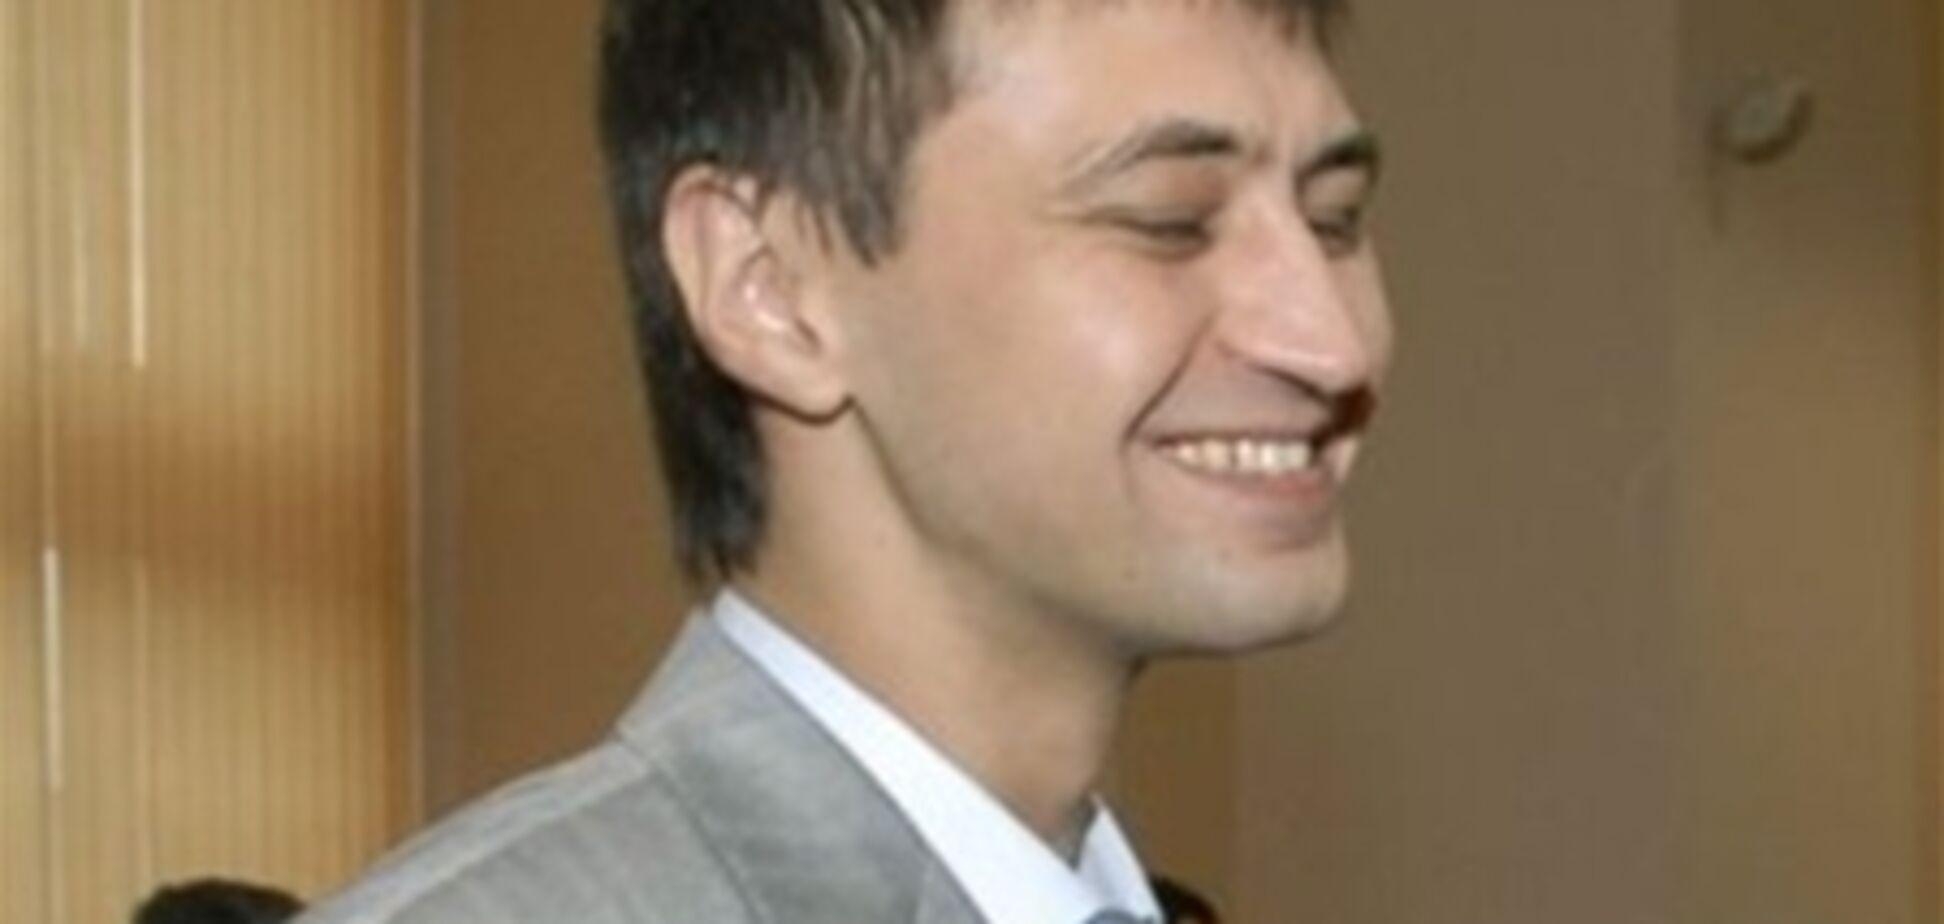 Адвокат: Ландик защищался, а Коршунова давно планировала удар